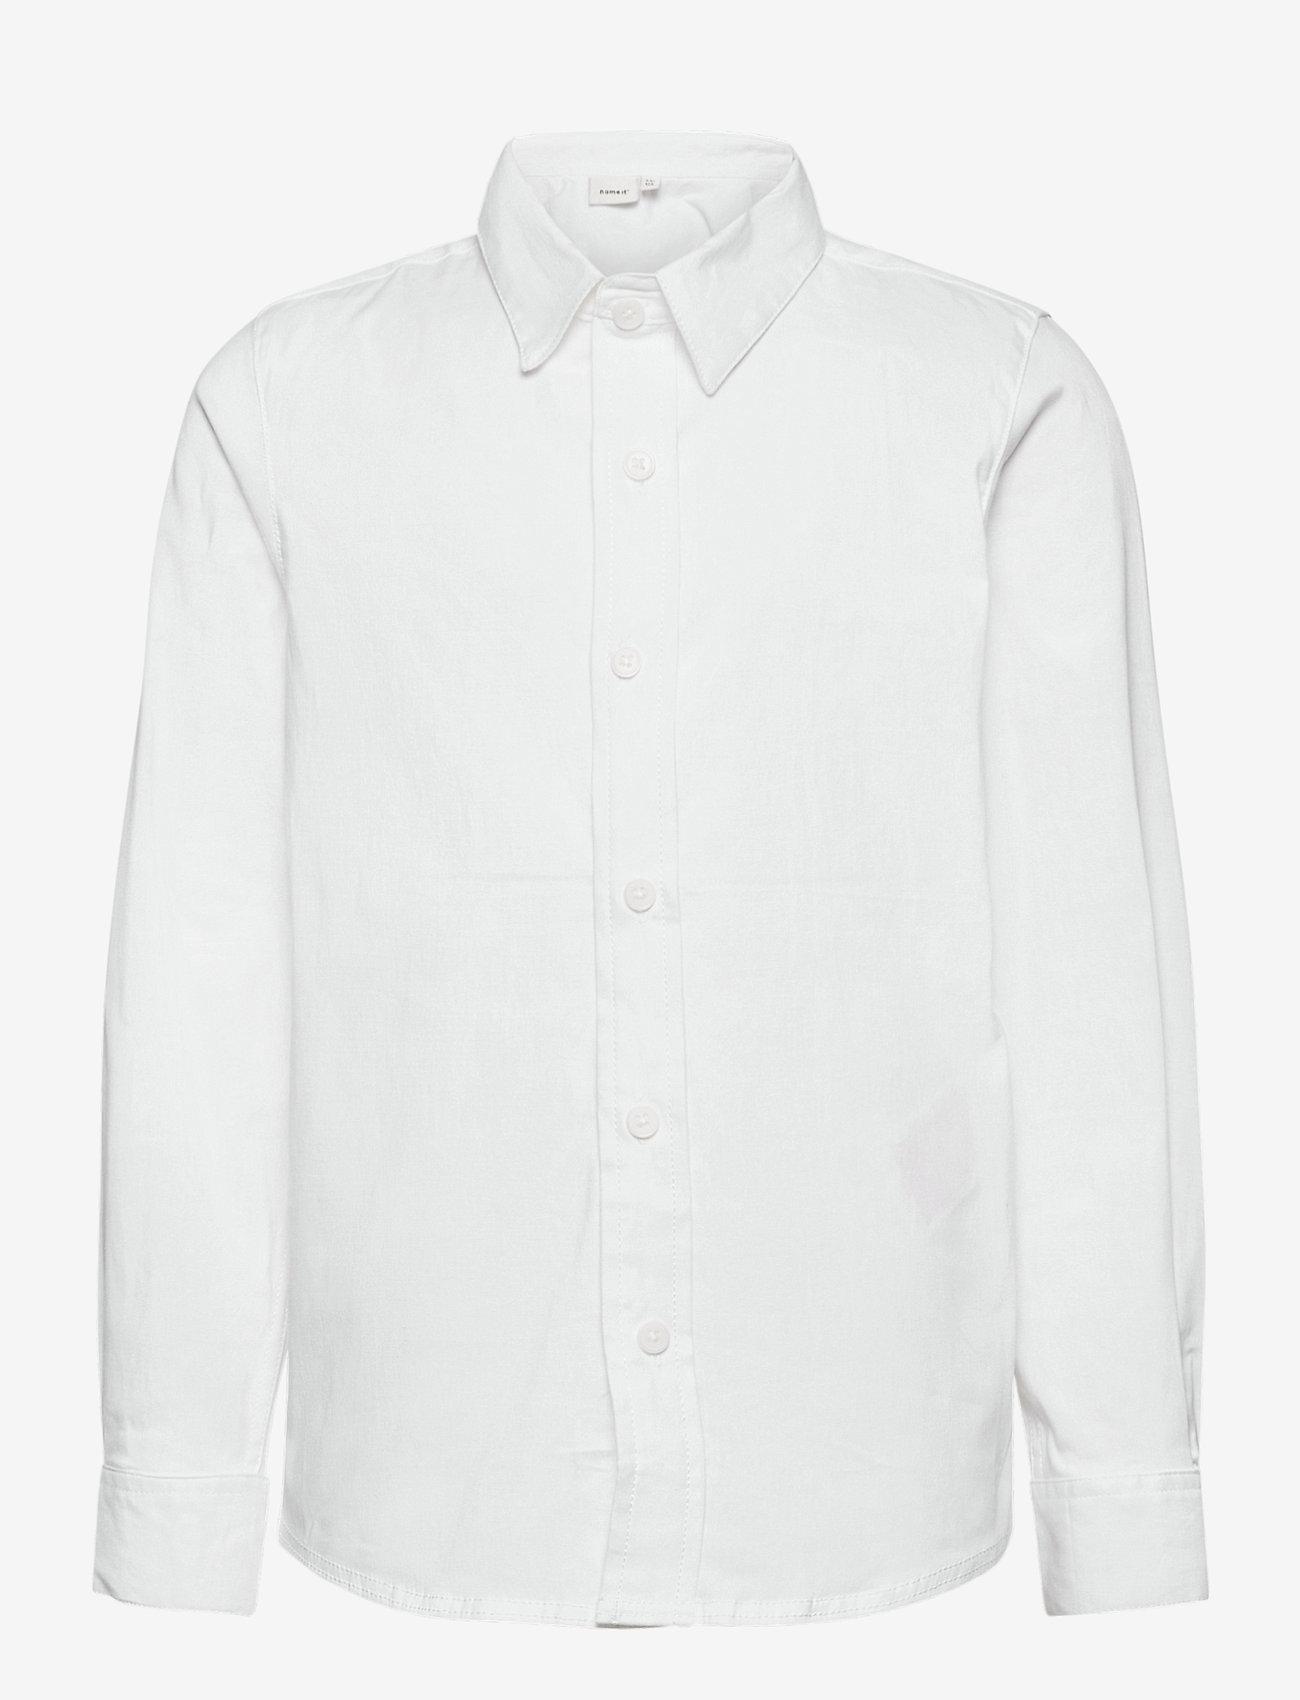 name it - NKMFRED LS SLIM SHIRT NOOS - shirts - bright white - 0